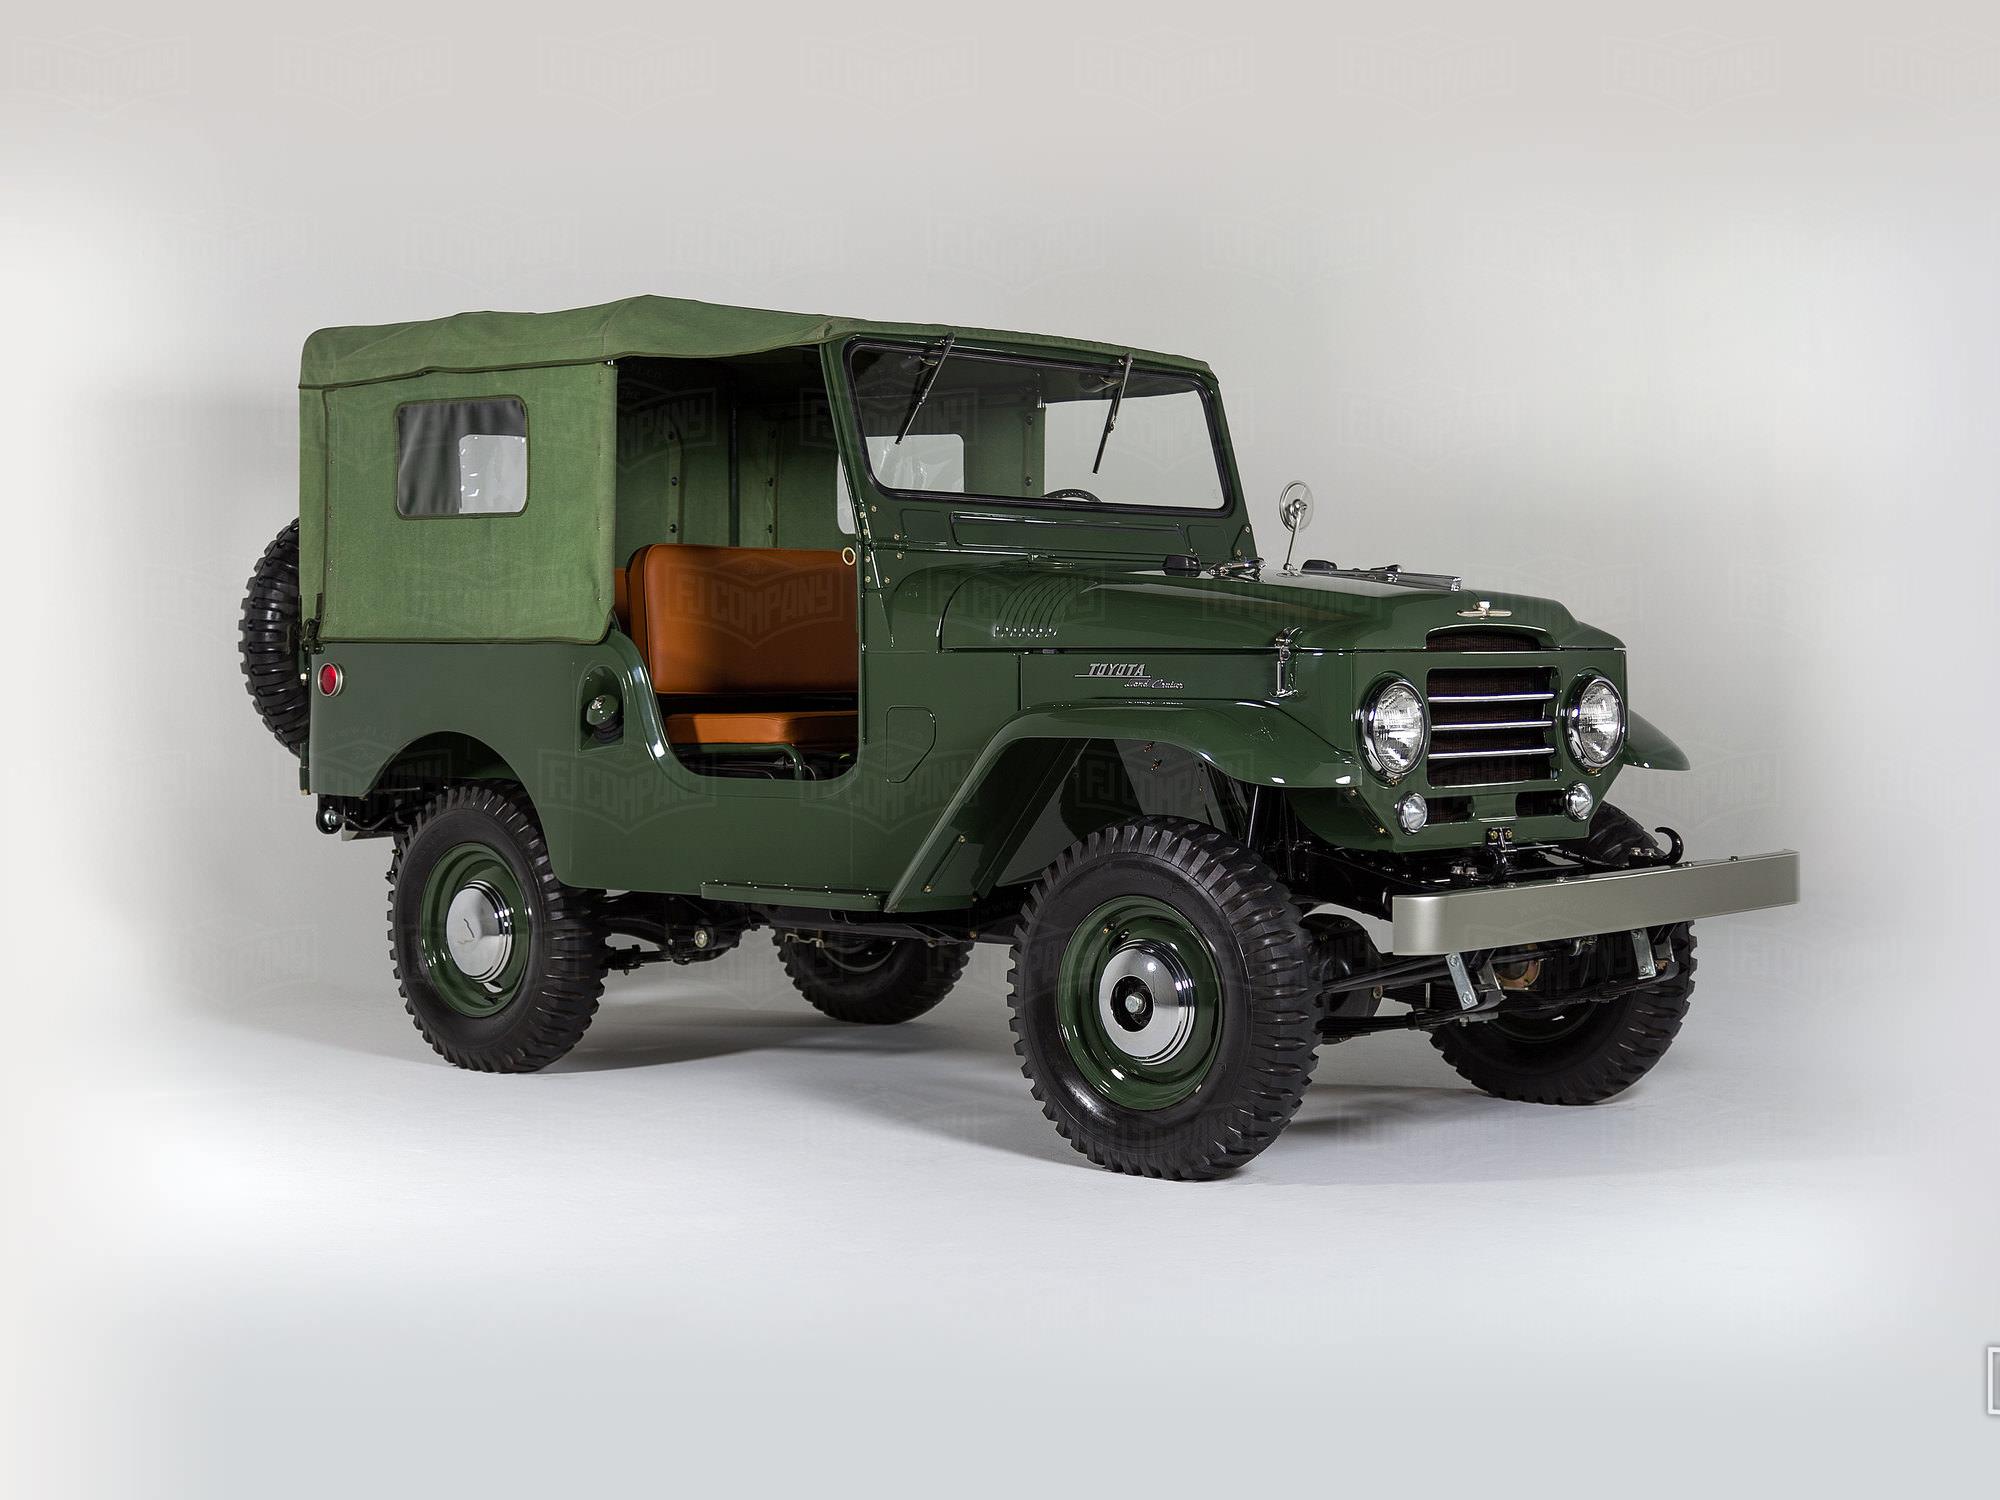 1960 Toyota Land Cruiser FJ25 21422 Army Green